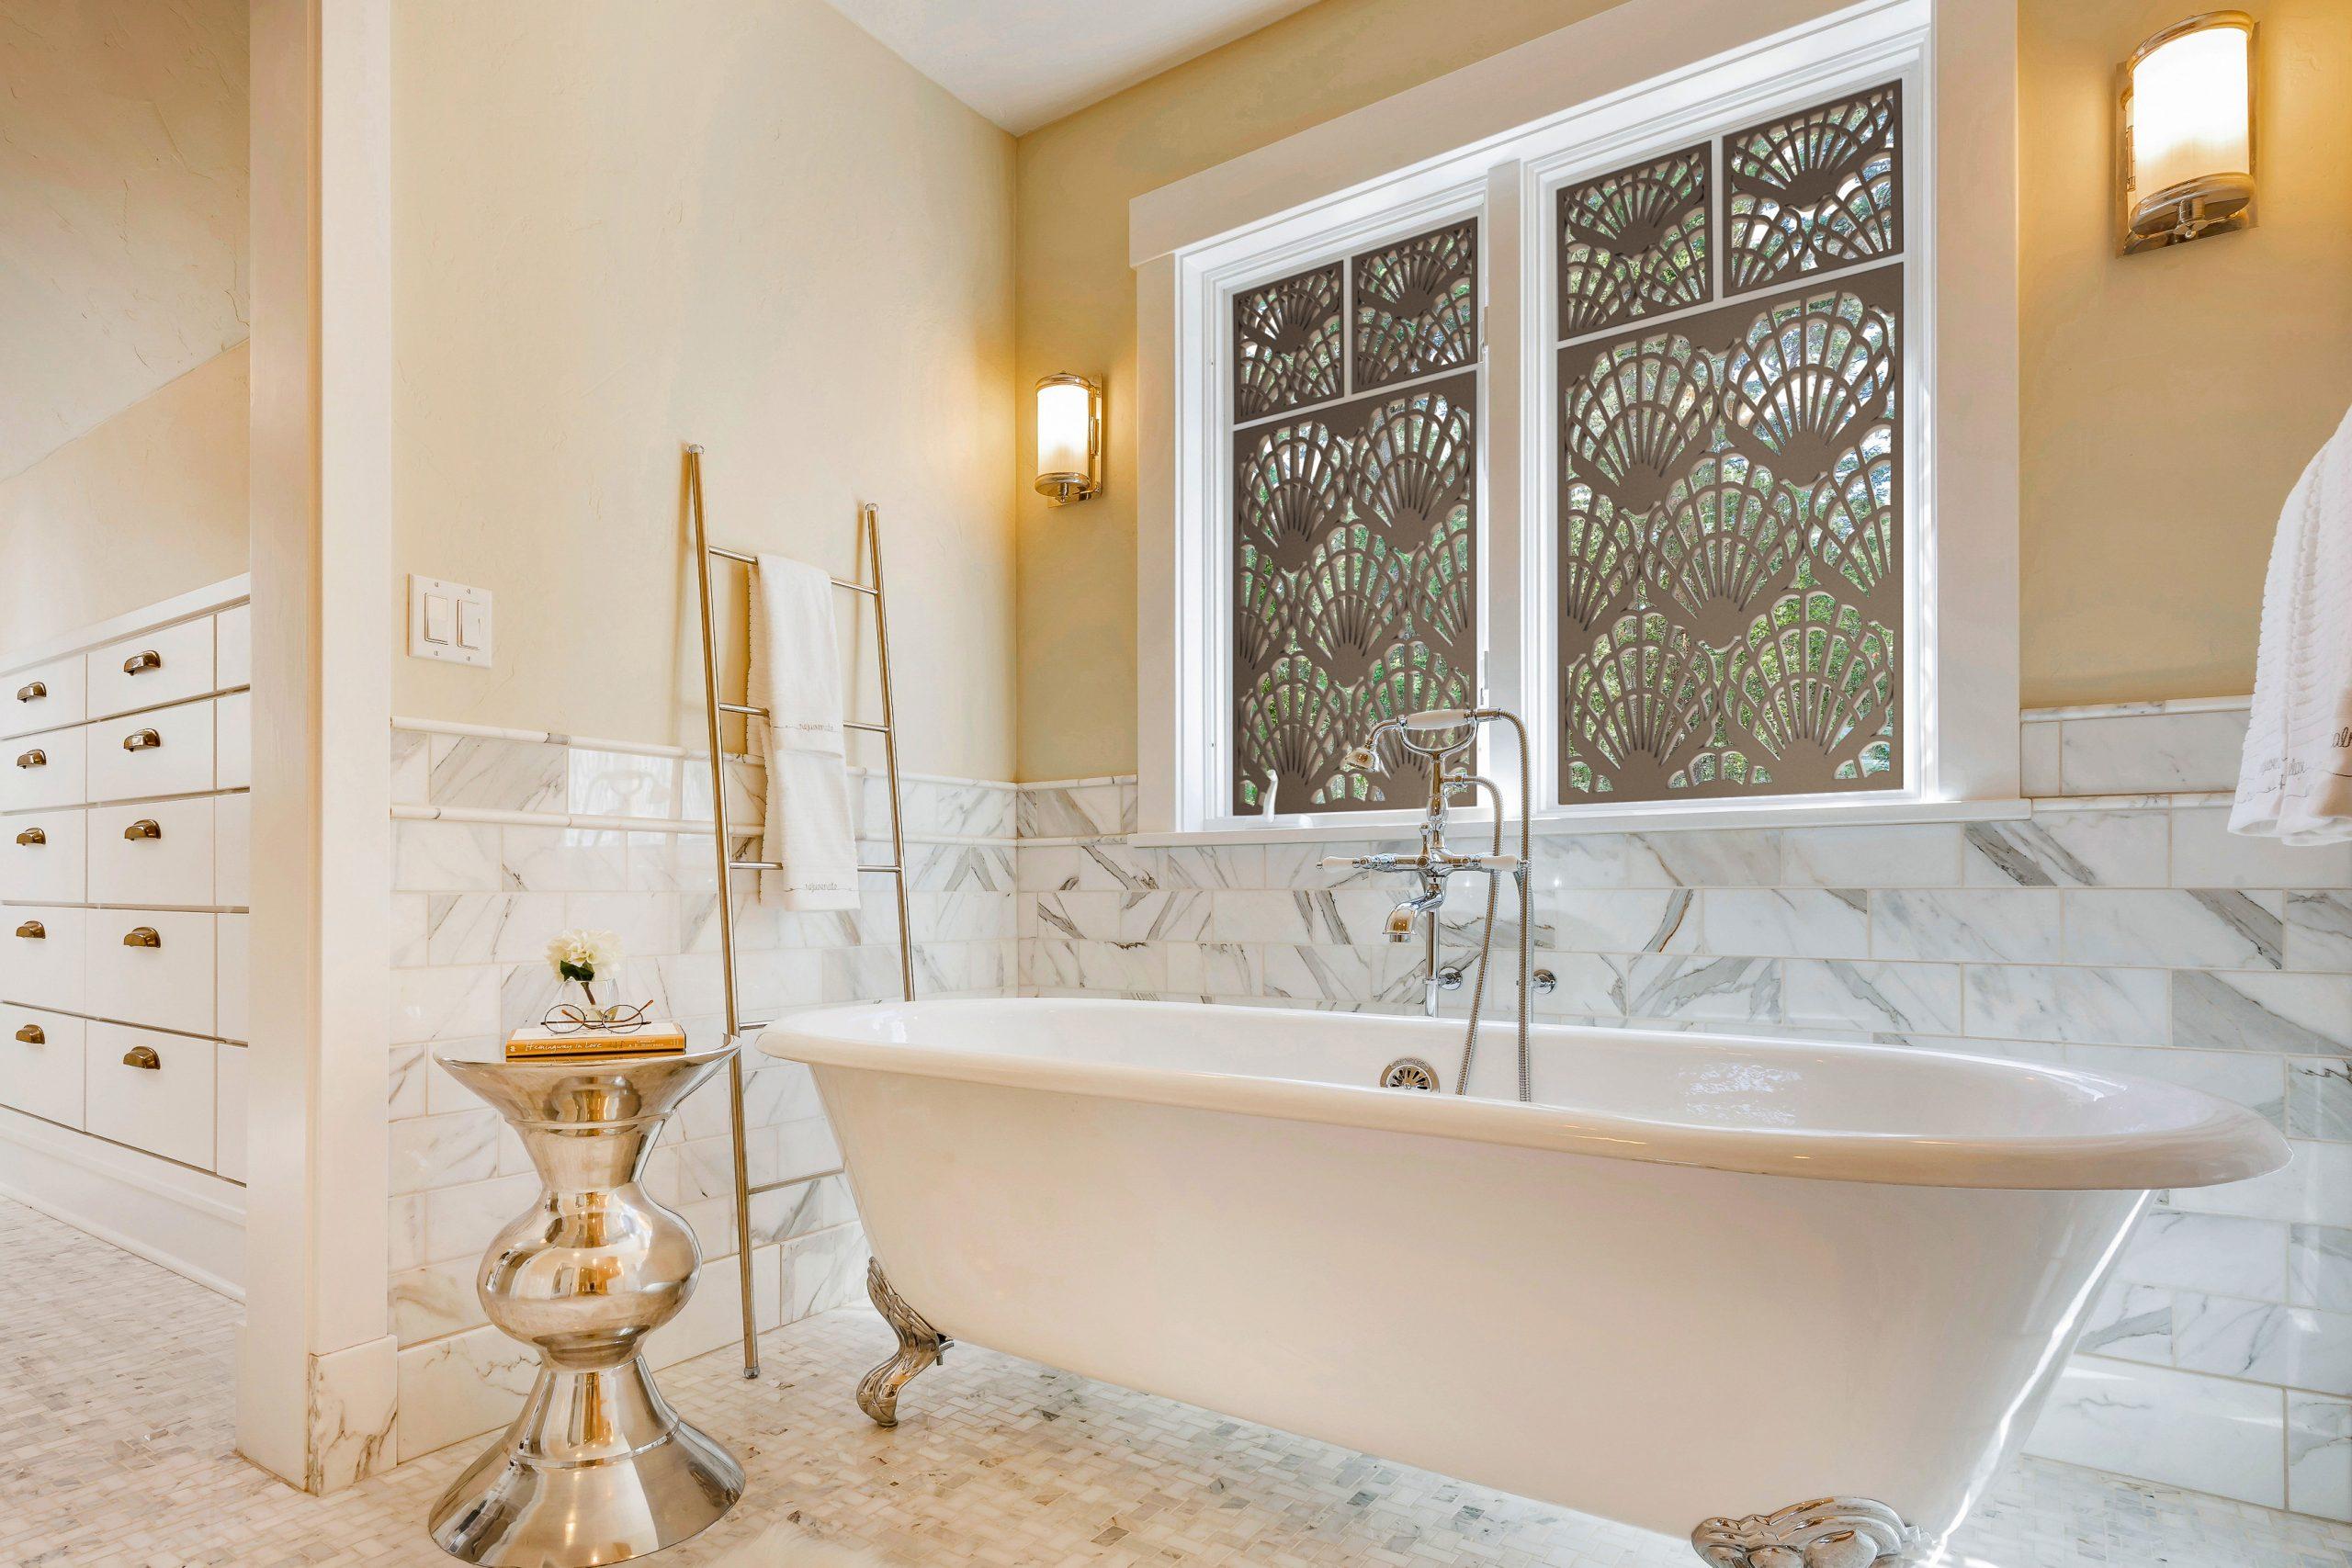 Tableaux Decorative Grilles custom window decor in master bath